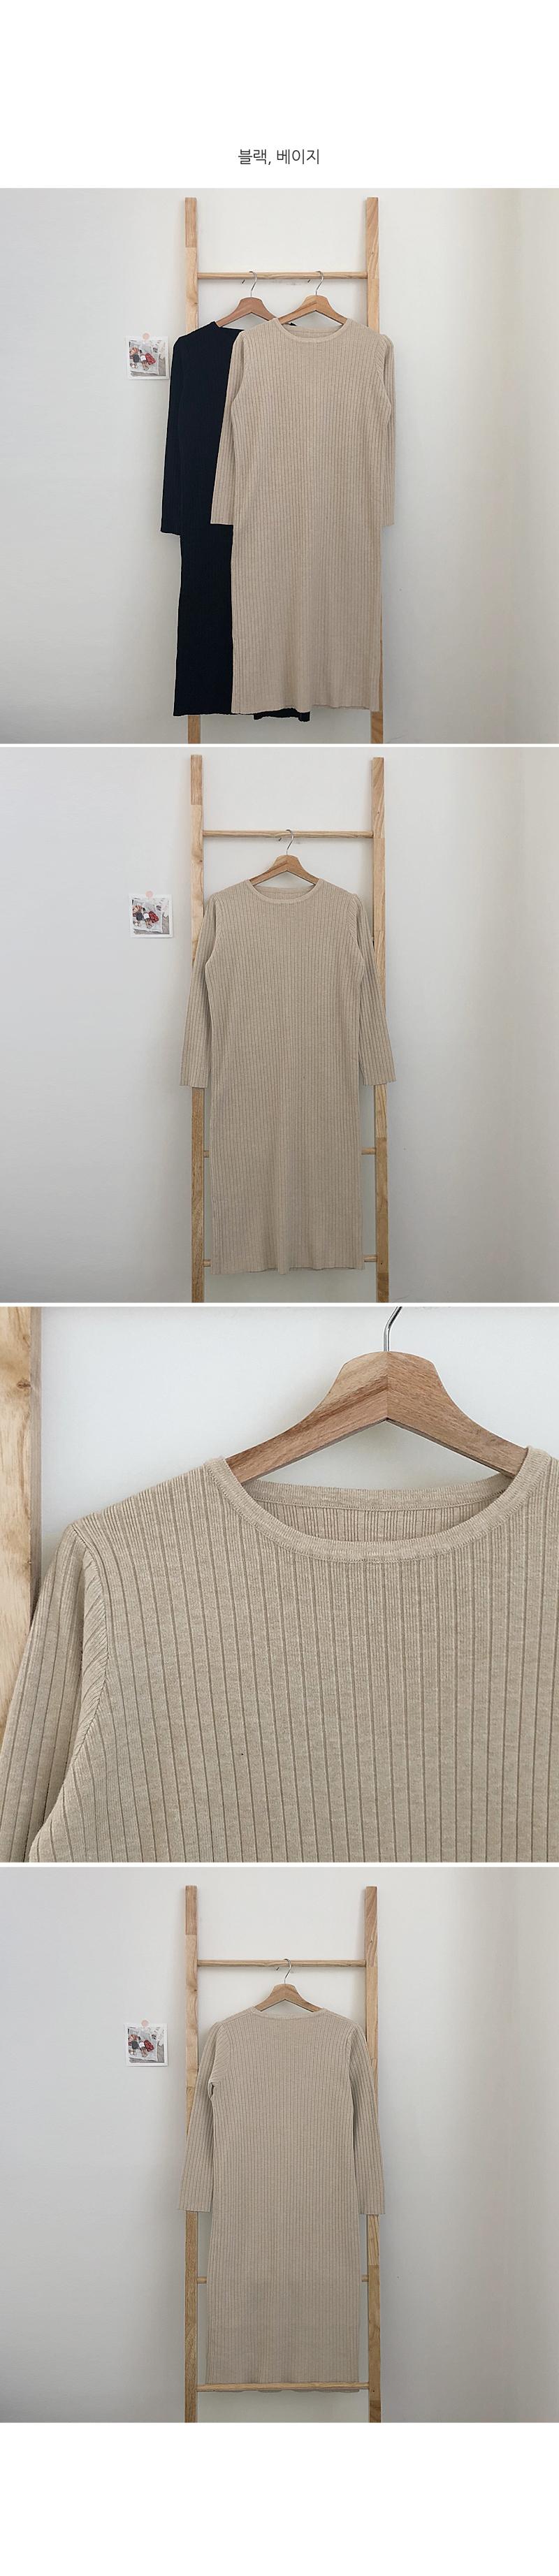 Square Ribbed long Dress